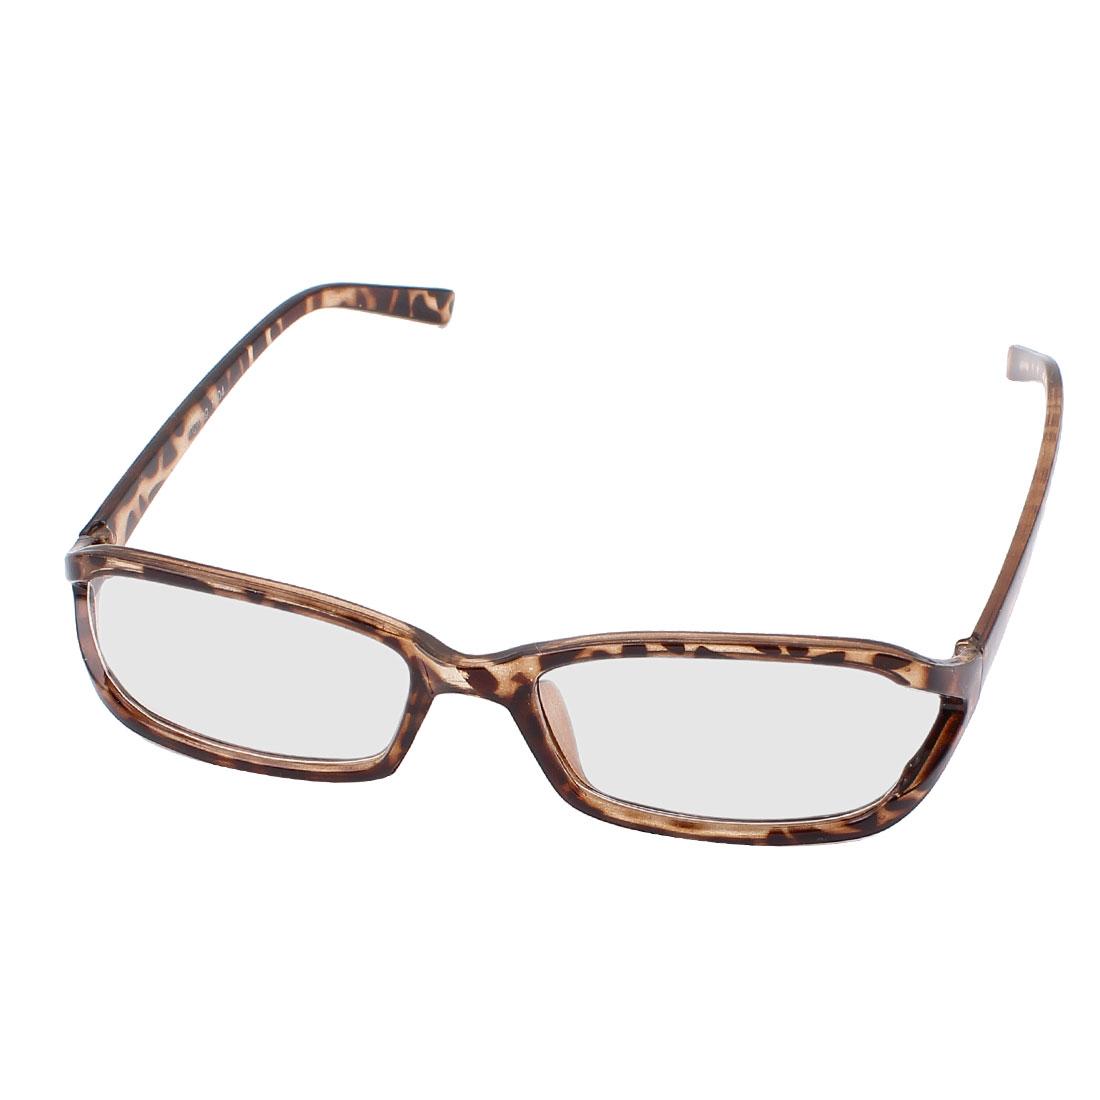 Leopard Pattern Arms Full Rim Single Bridge Clear Lens Plain Glasses Plano Spectacle